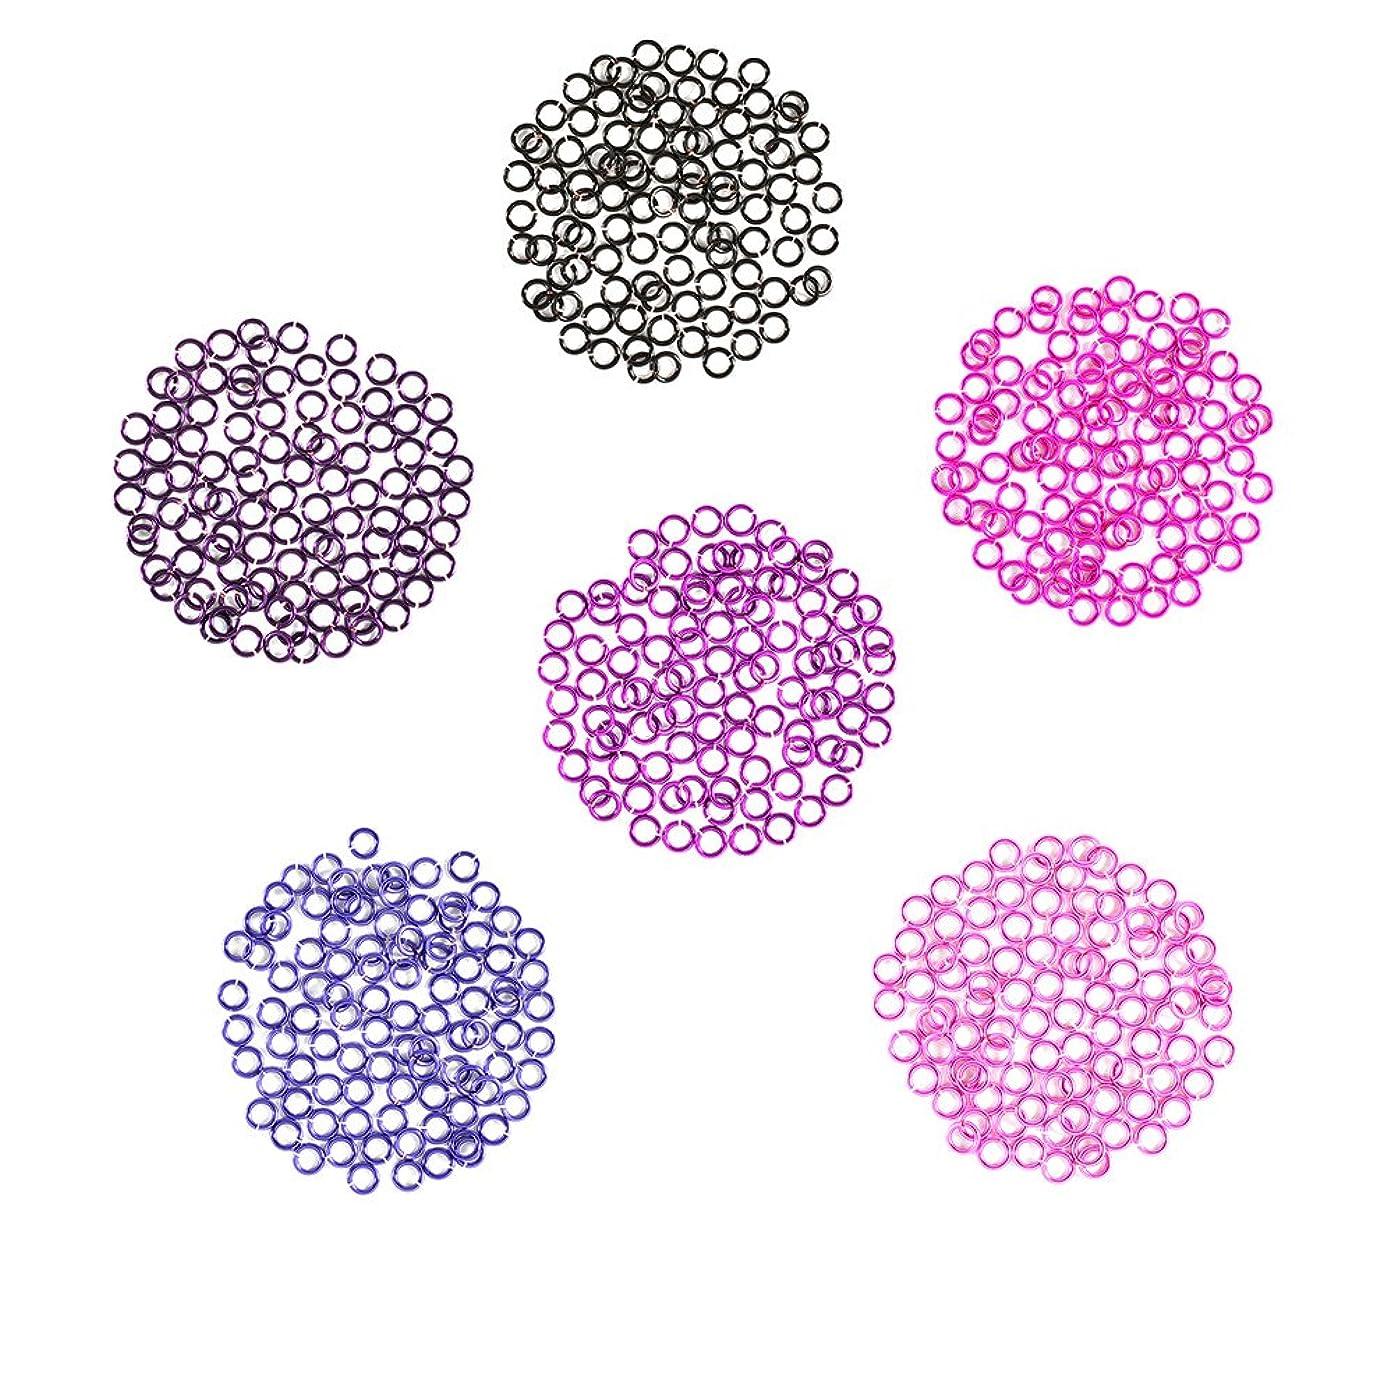 Berry Patch - Enameled Copper Jump Rings – 20 Gauge – 3.5mm ID - 600 Rings - Amethyst, Black, Fuchsia, Hot Pink, Lavender, Purple